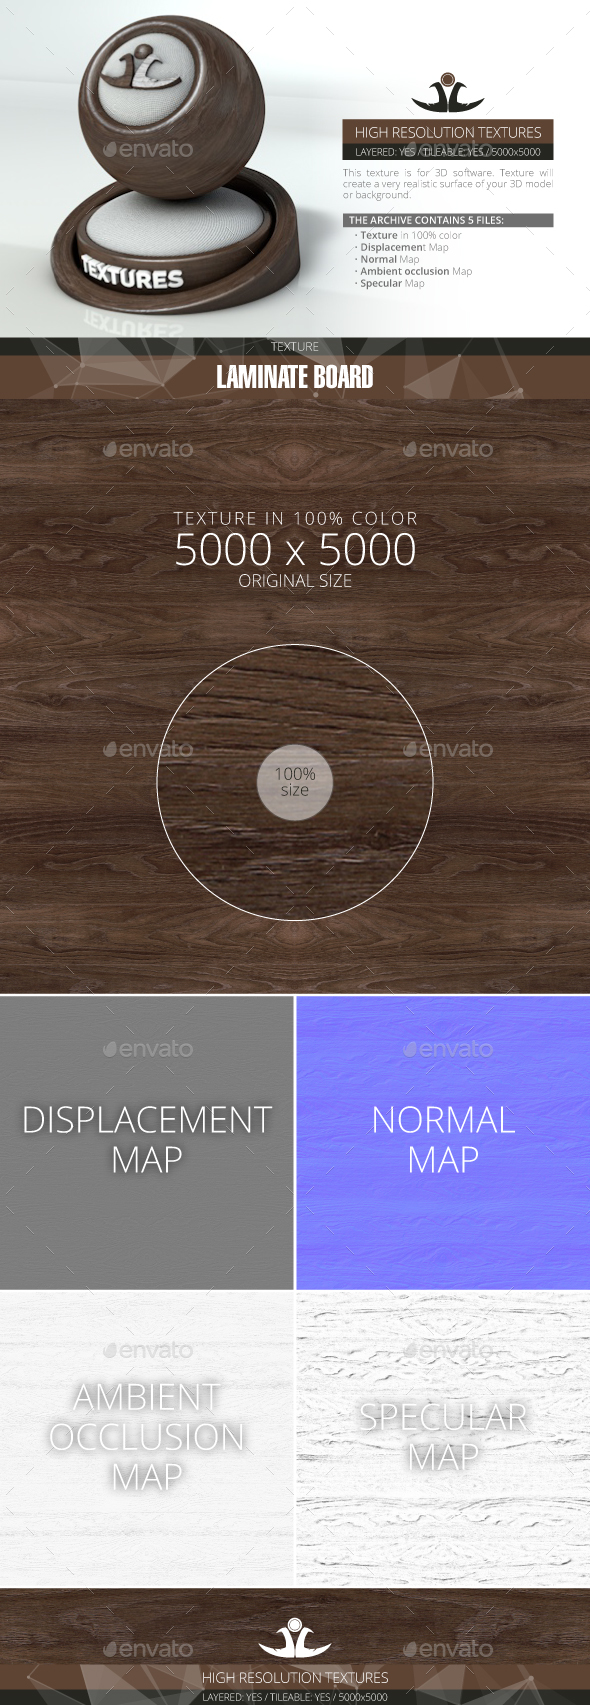 Laminate Board 6 - 3DOcean Item for Sale